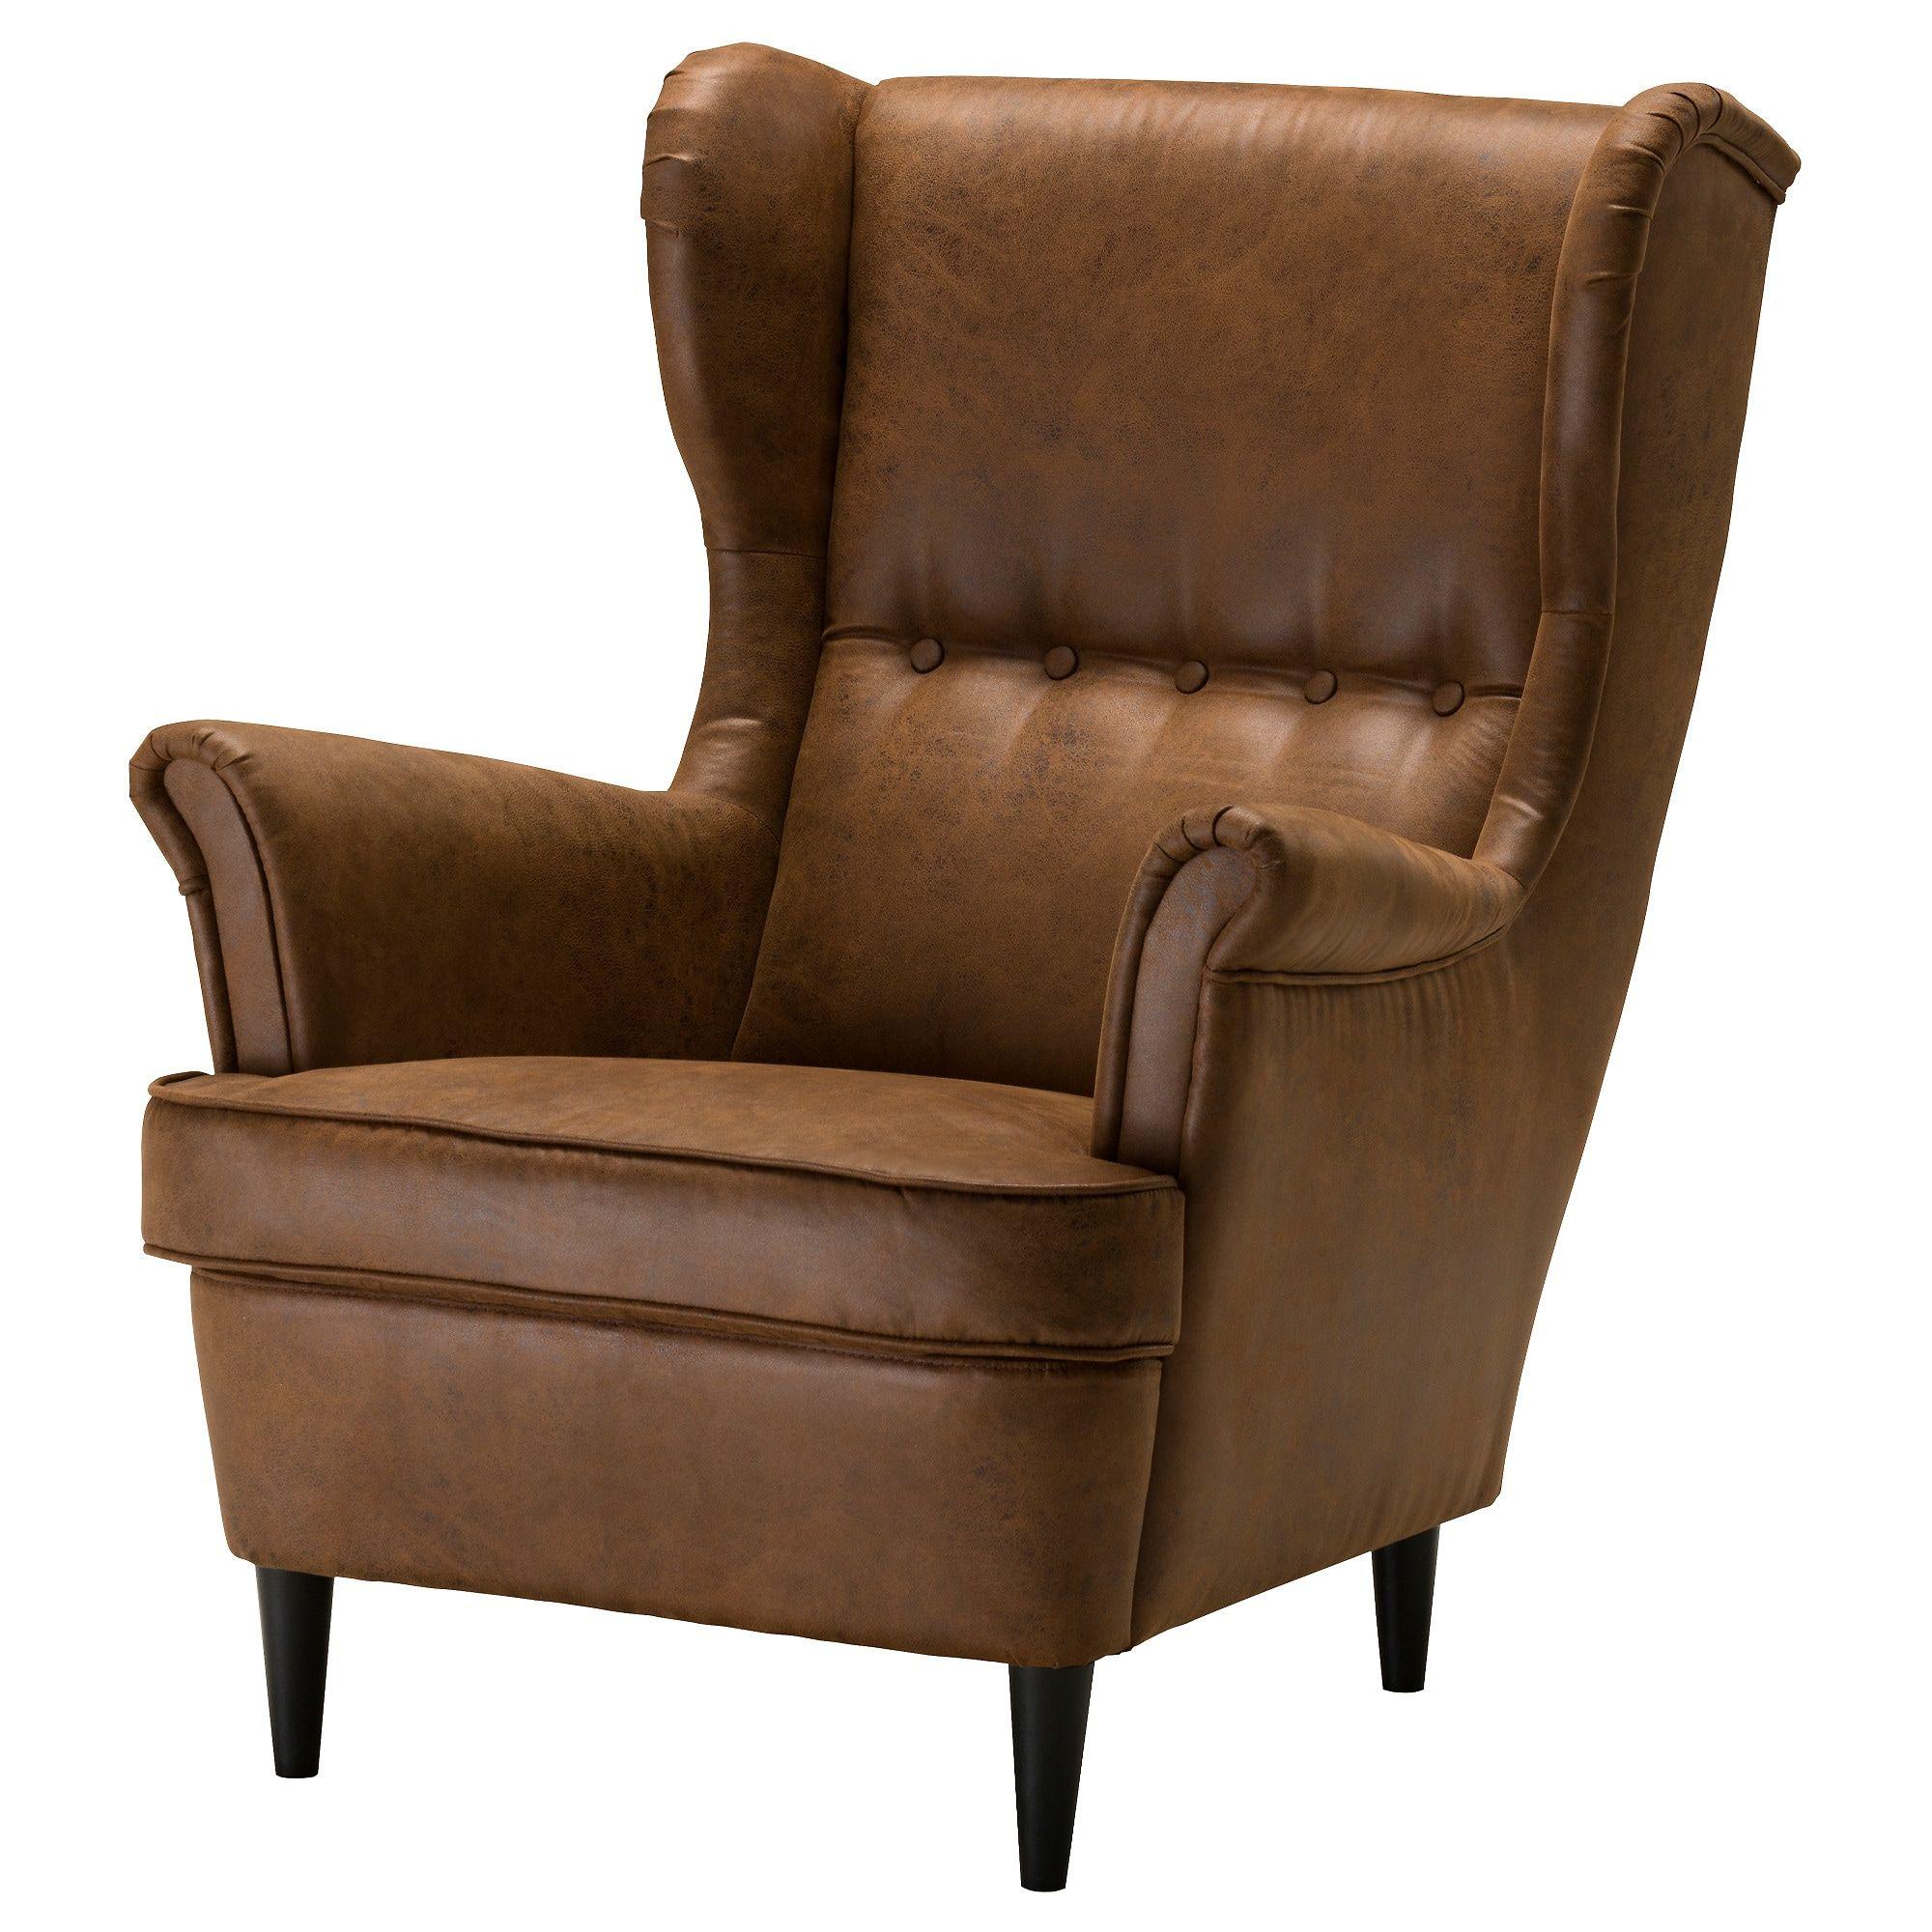 Ikea Leren Stoel.Us Furniture And Home Furnishings Lederen Stoelen Stoel Ikea